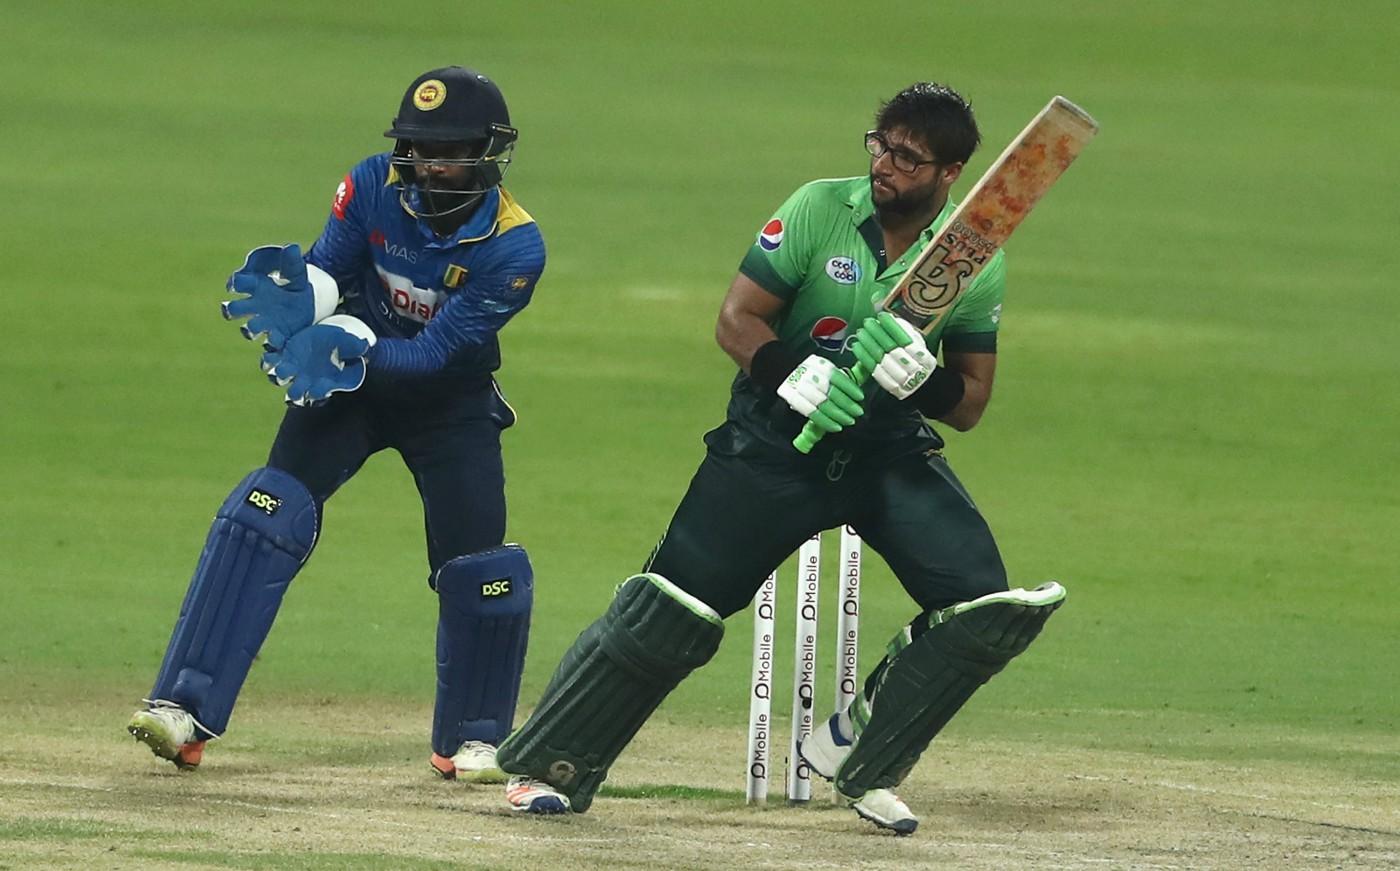 Hasan Ali's five-fer and Imam-ul-Haq's debut ton help Pakistan to seal series win over Sri Lanka